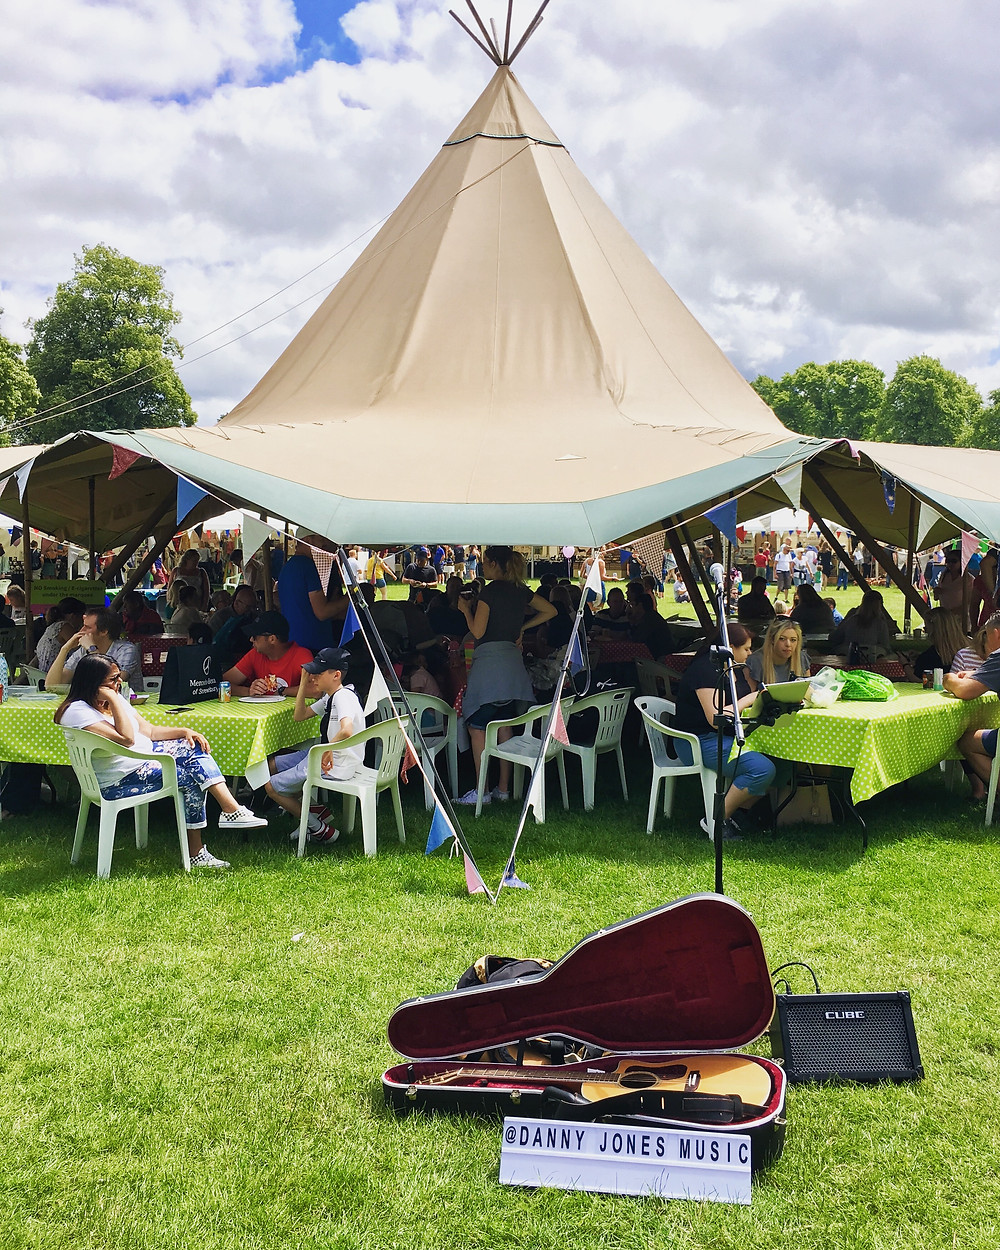 Danny Jones Music busking acoustic covers at Shrewsbury Food Festival